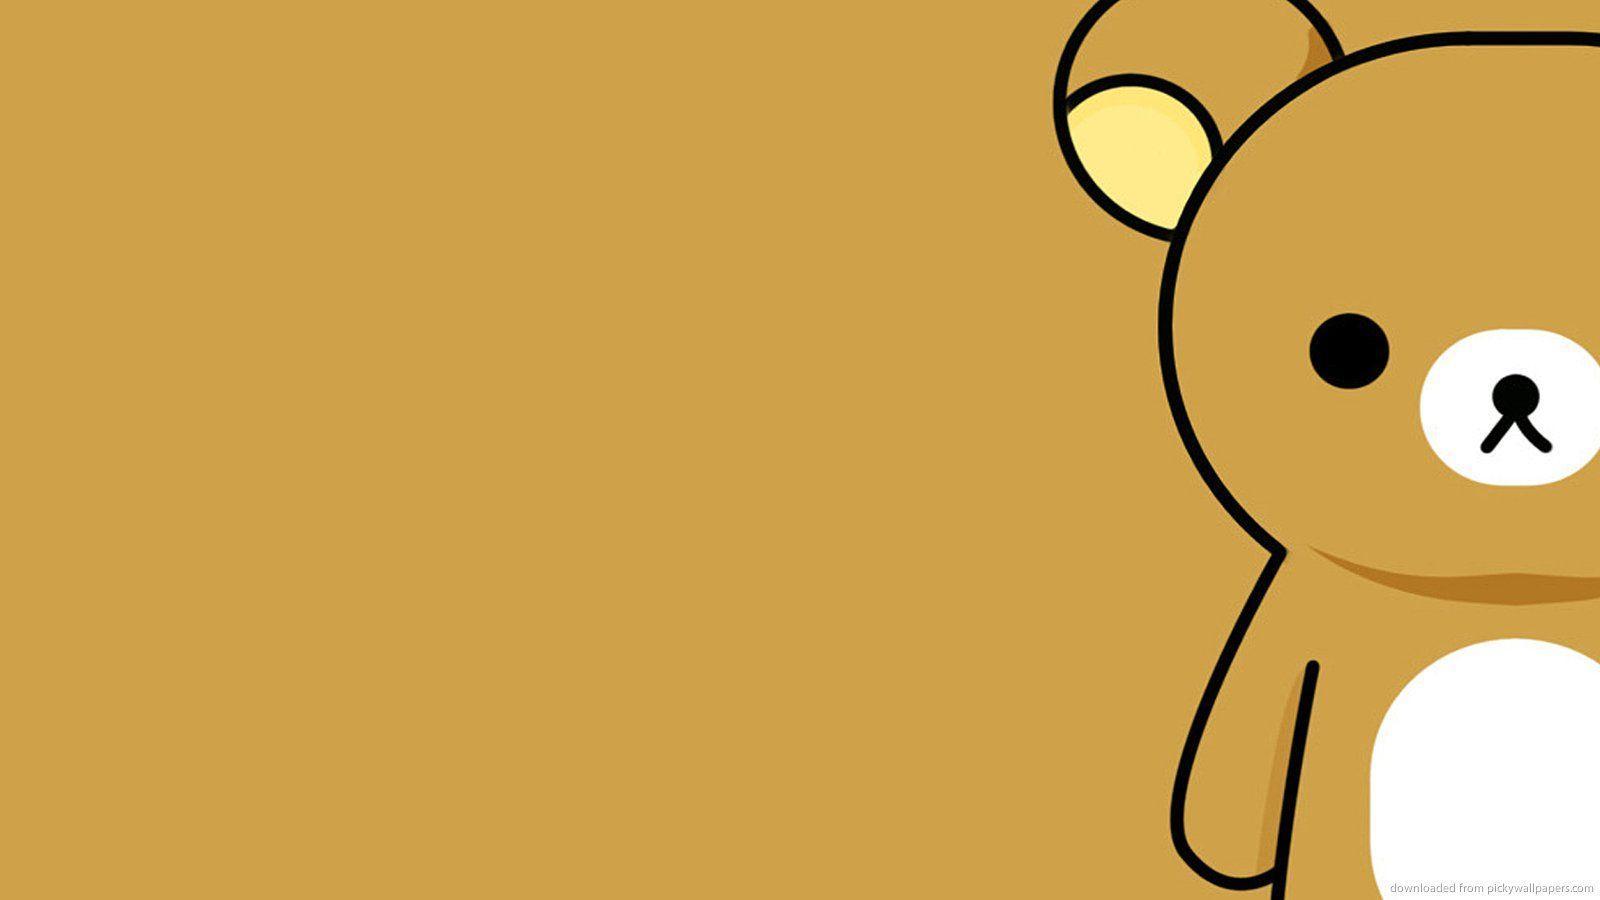 Animated Cartoon Desktop Wallpapers Top Free Animated Cartoon